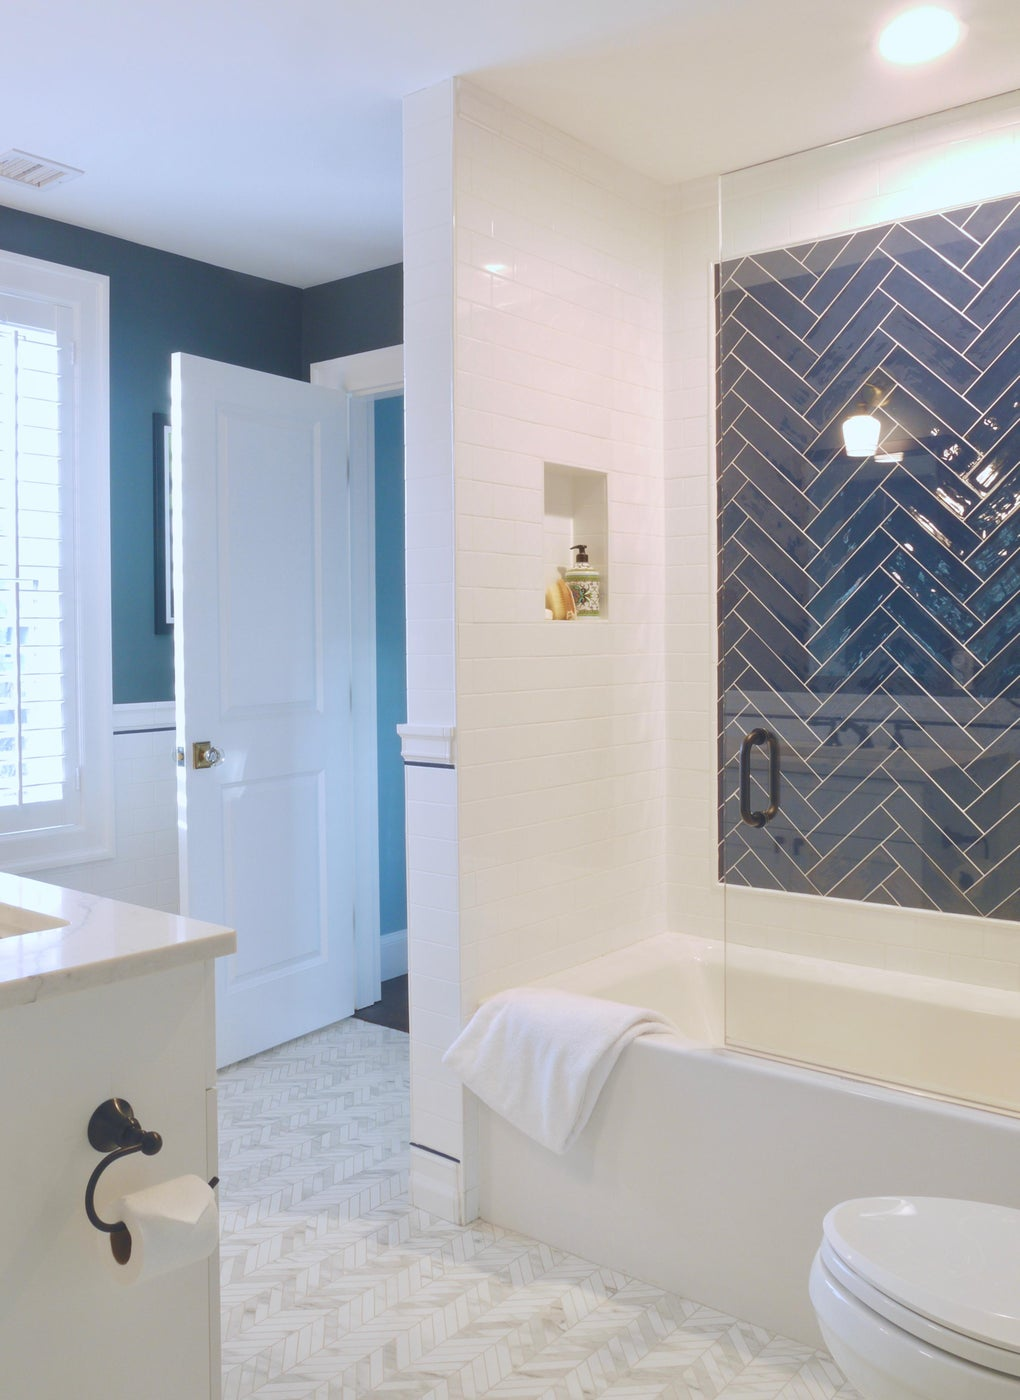 Blue and White Herringbone Boys Bath with Porcelain Chevron Floors